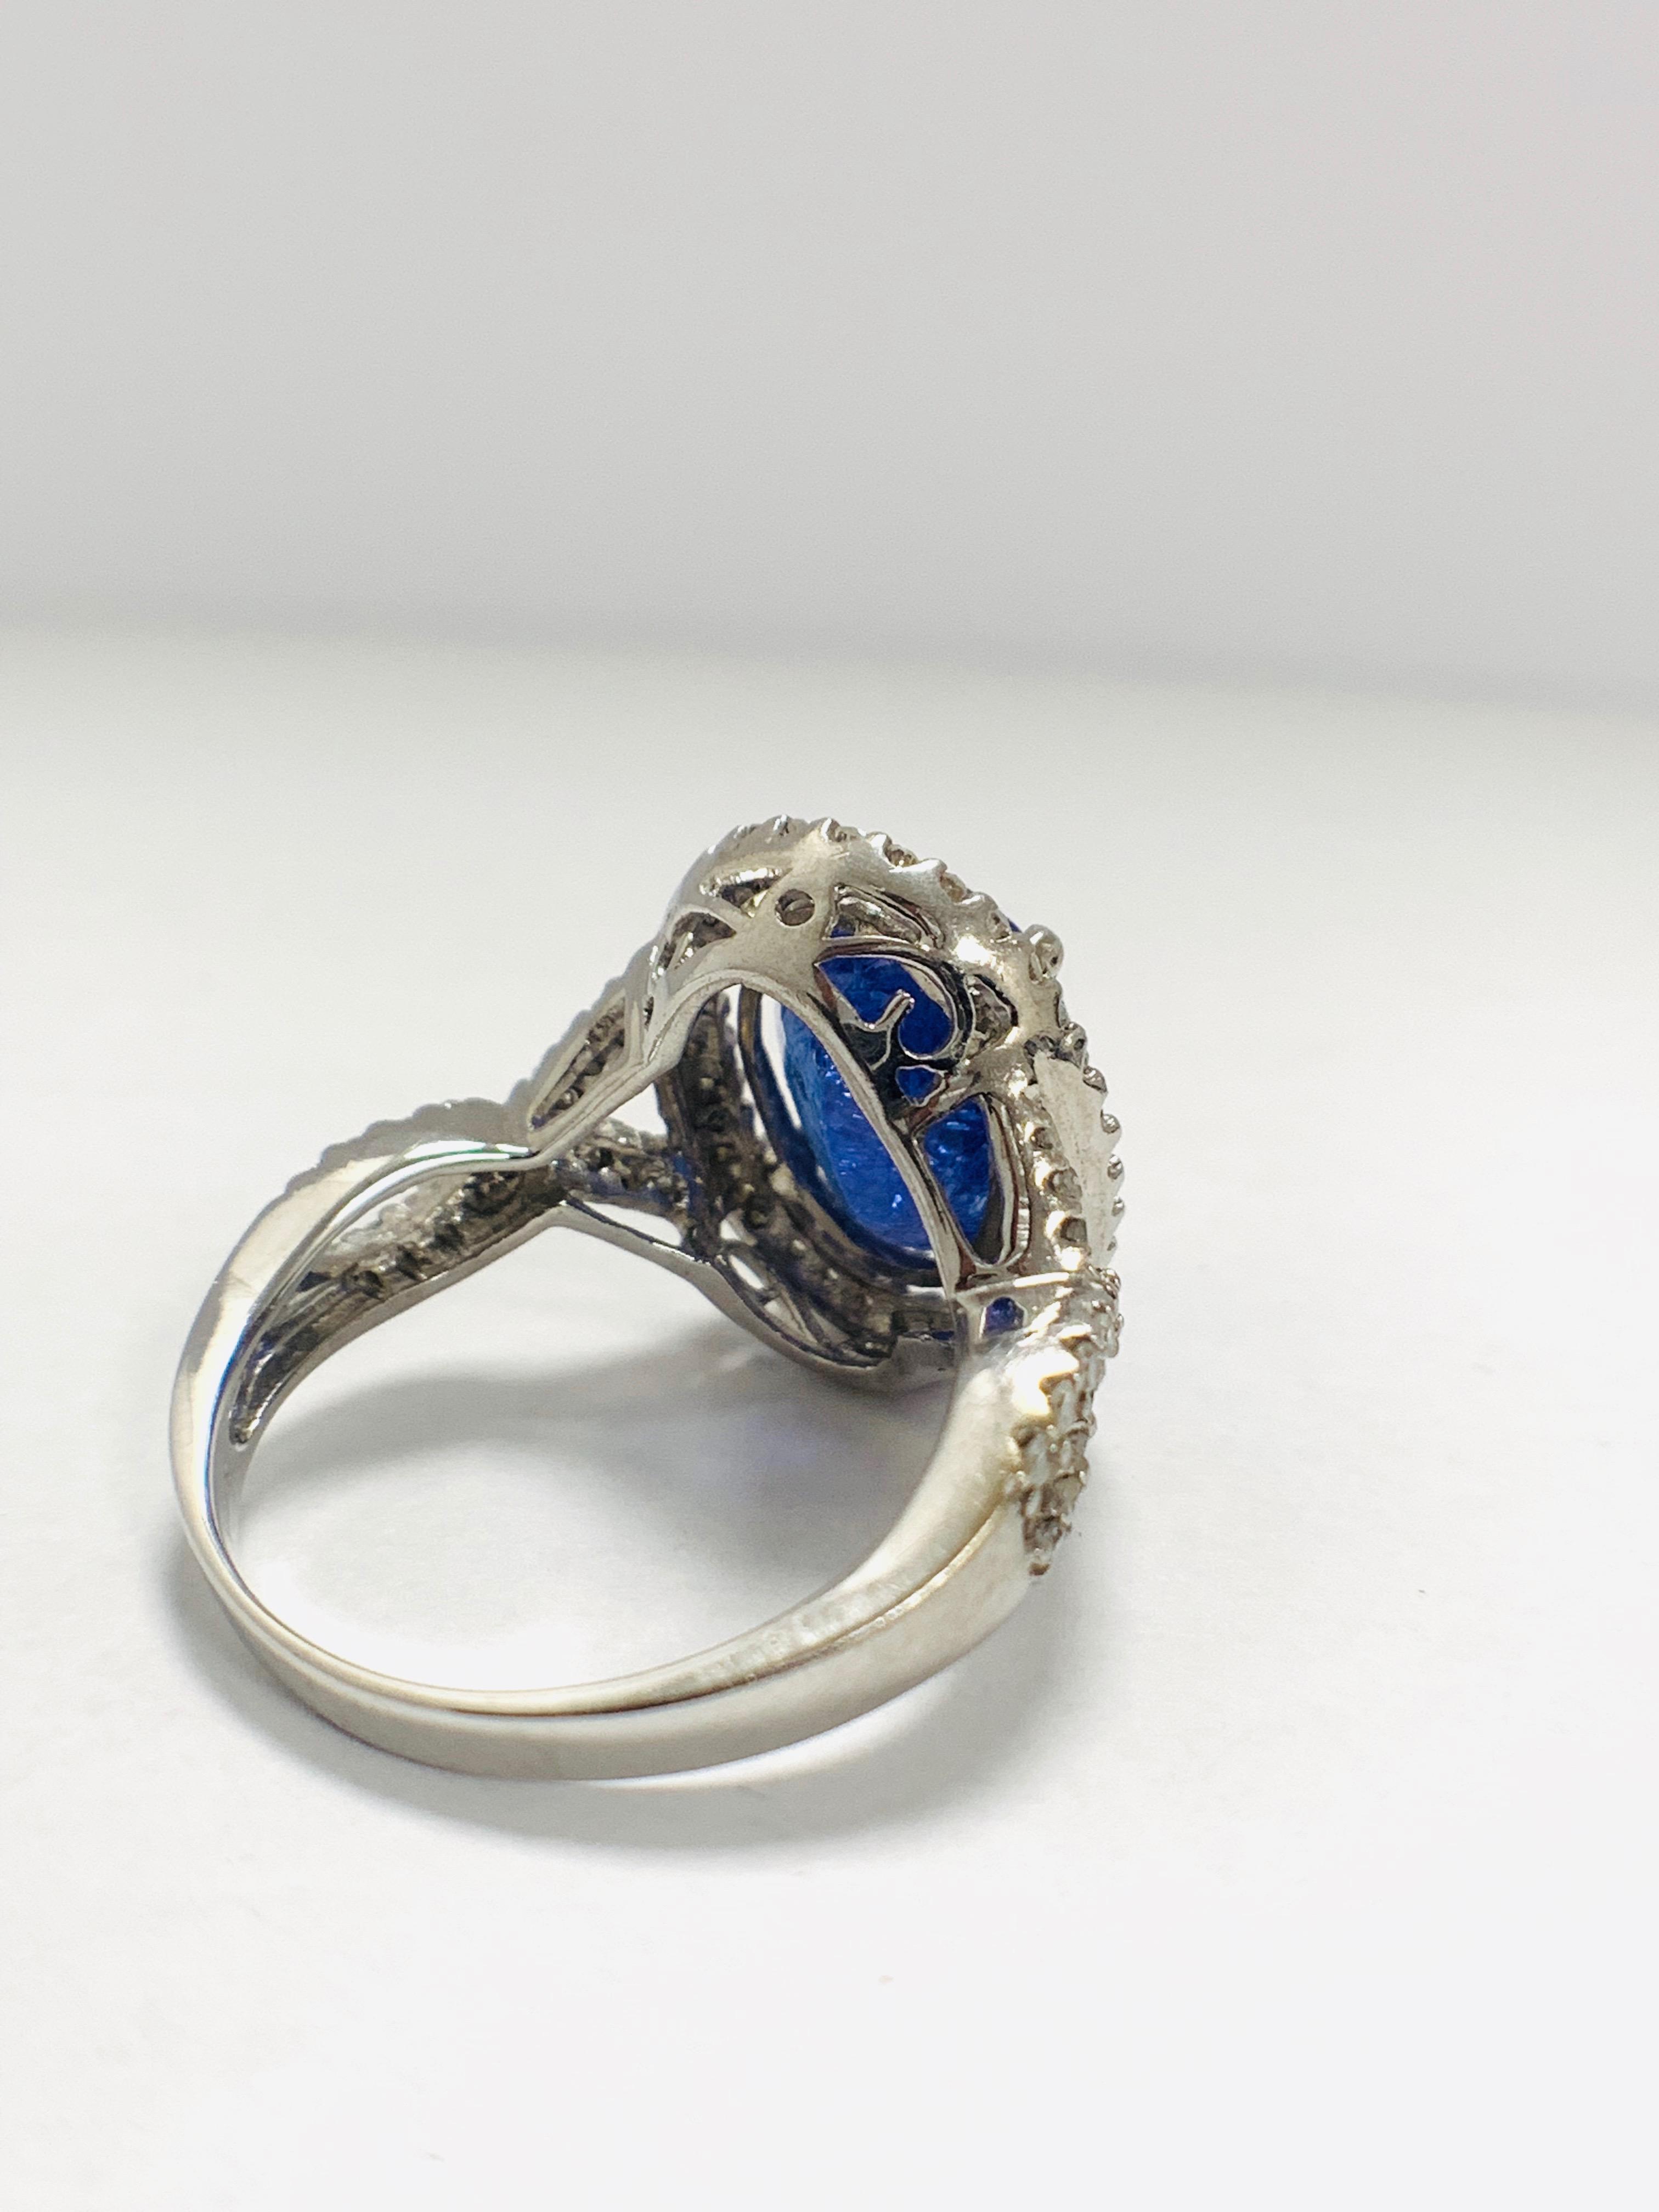 18ct White Gold Tanzanite and Diamond ring - Image 5 of 15